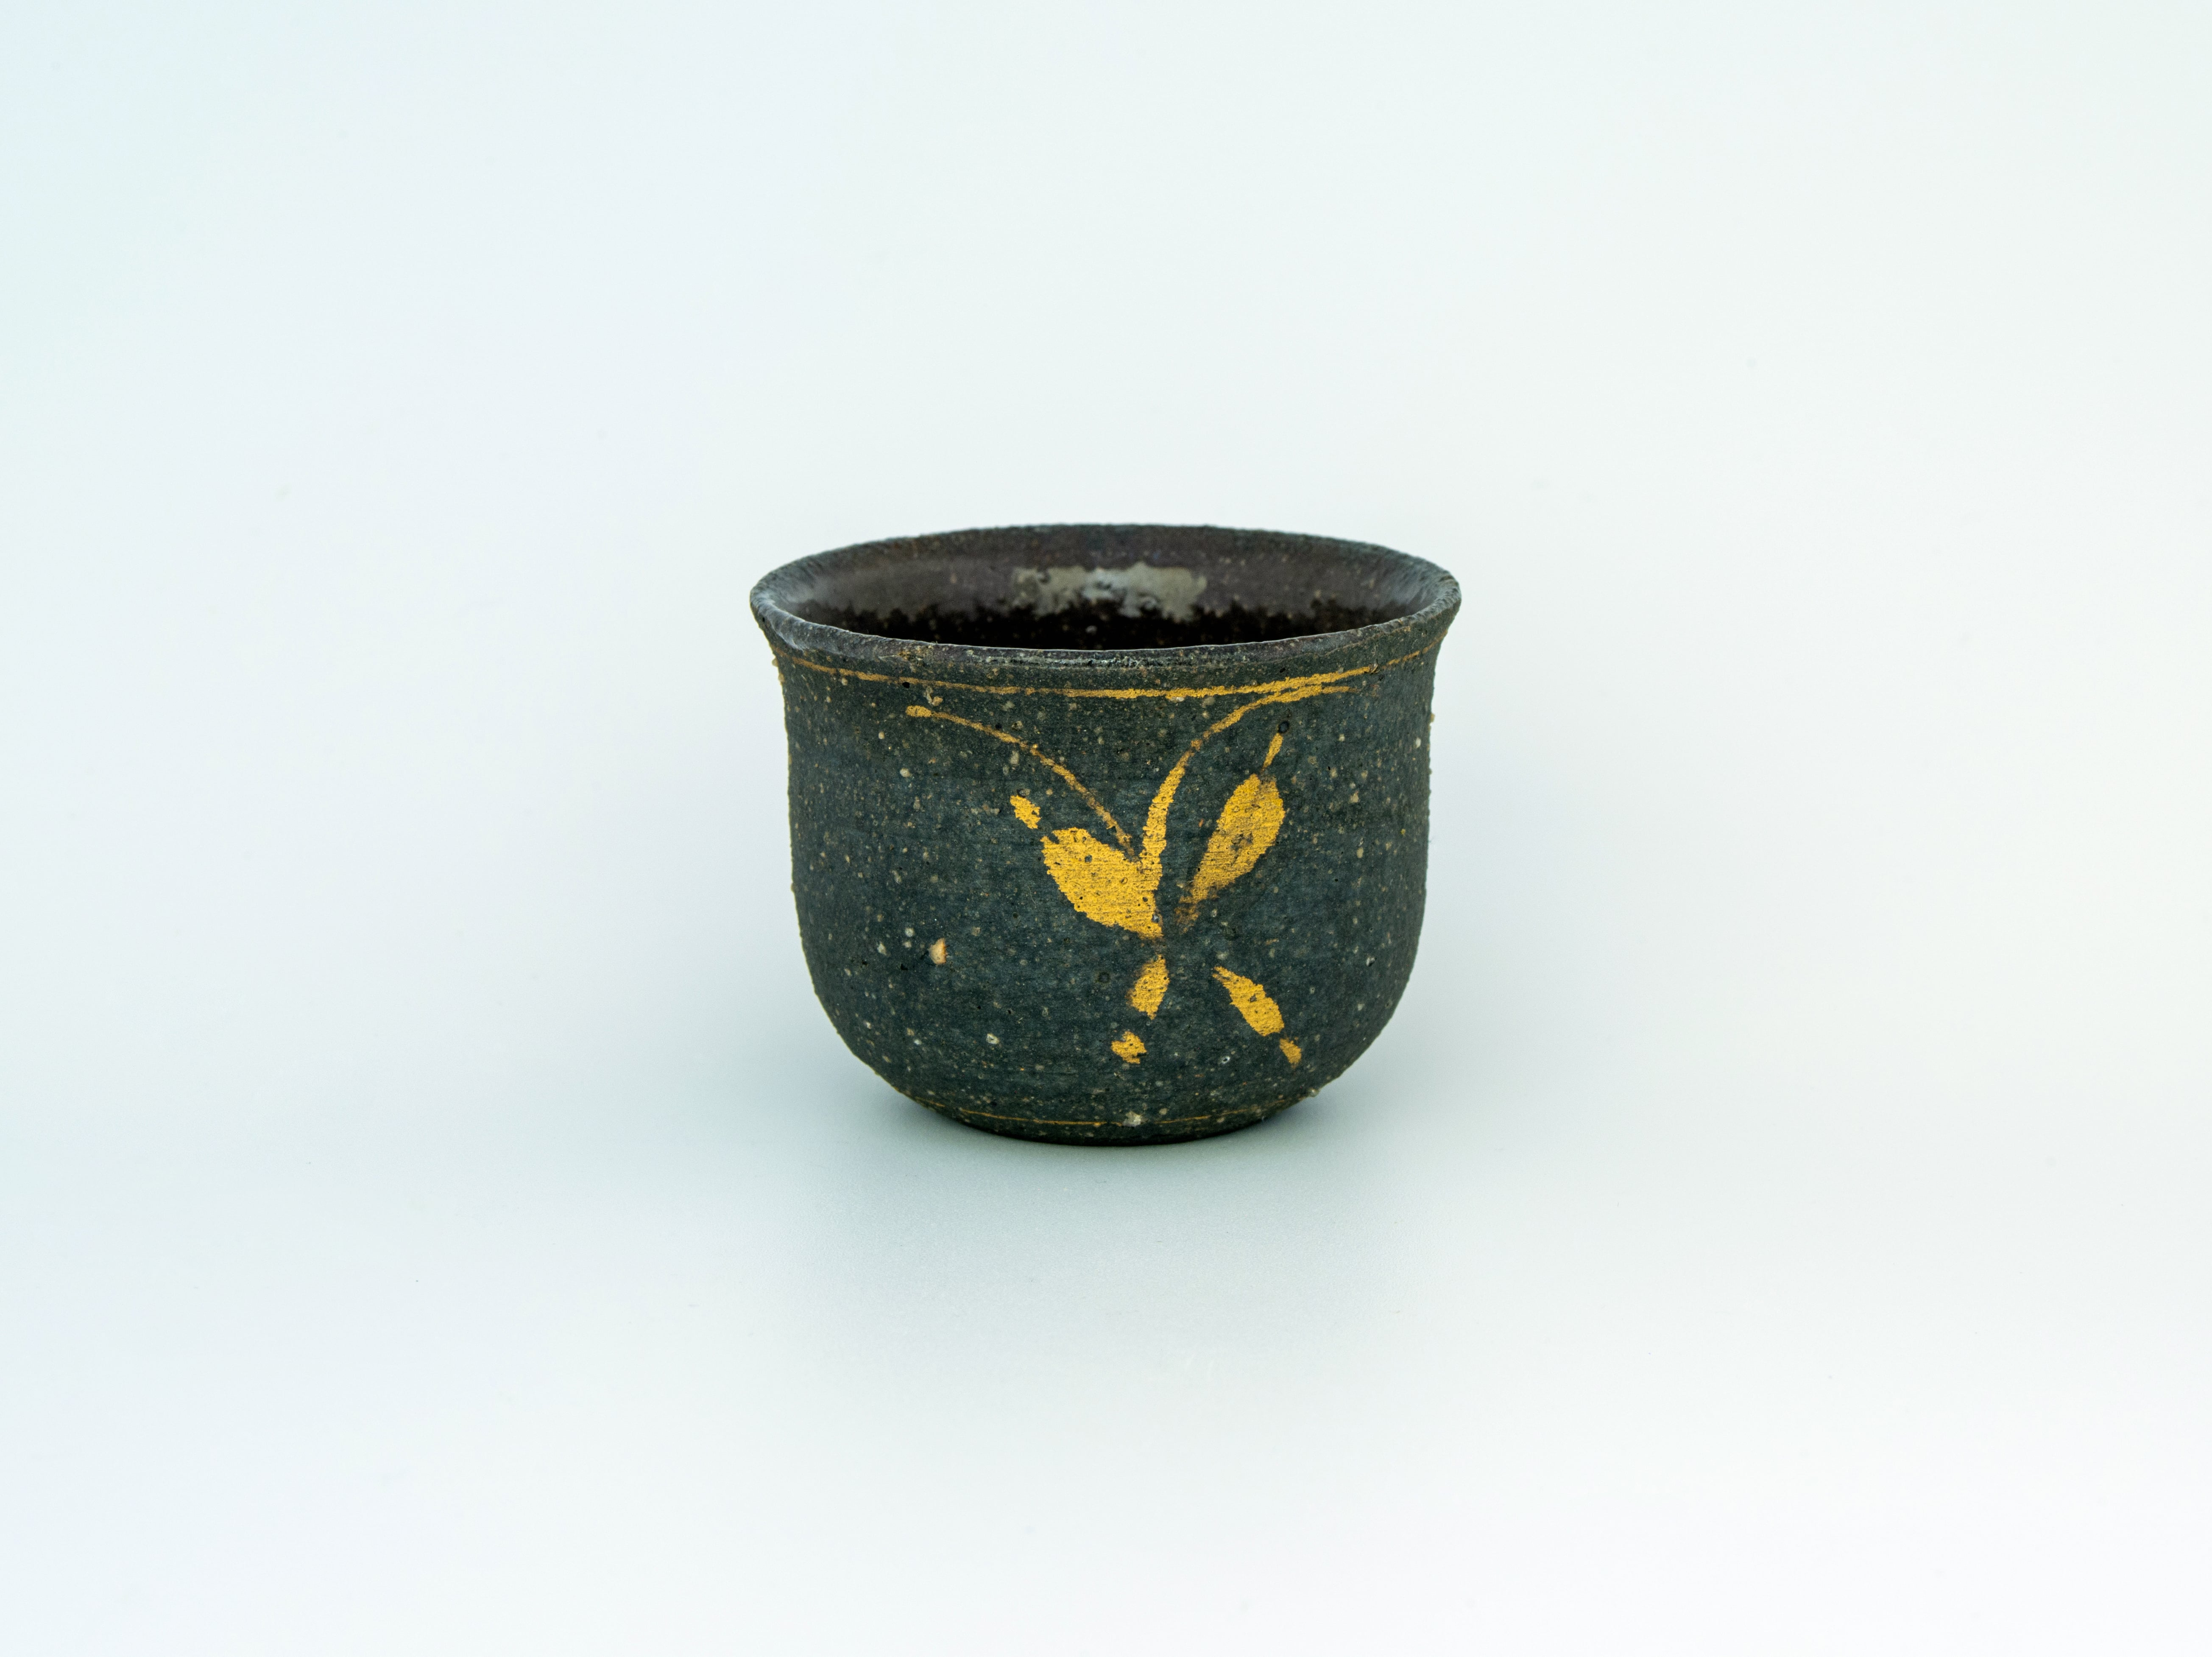 Kyo ware cup